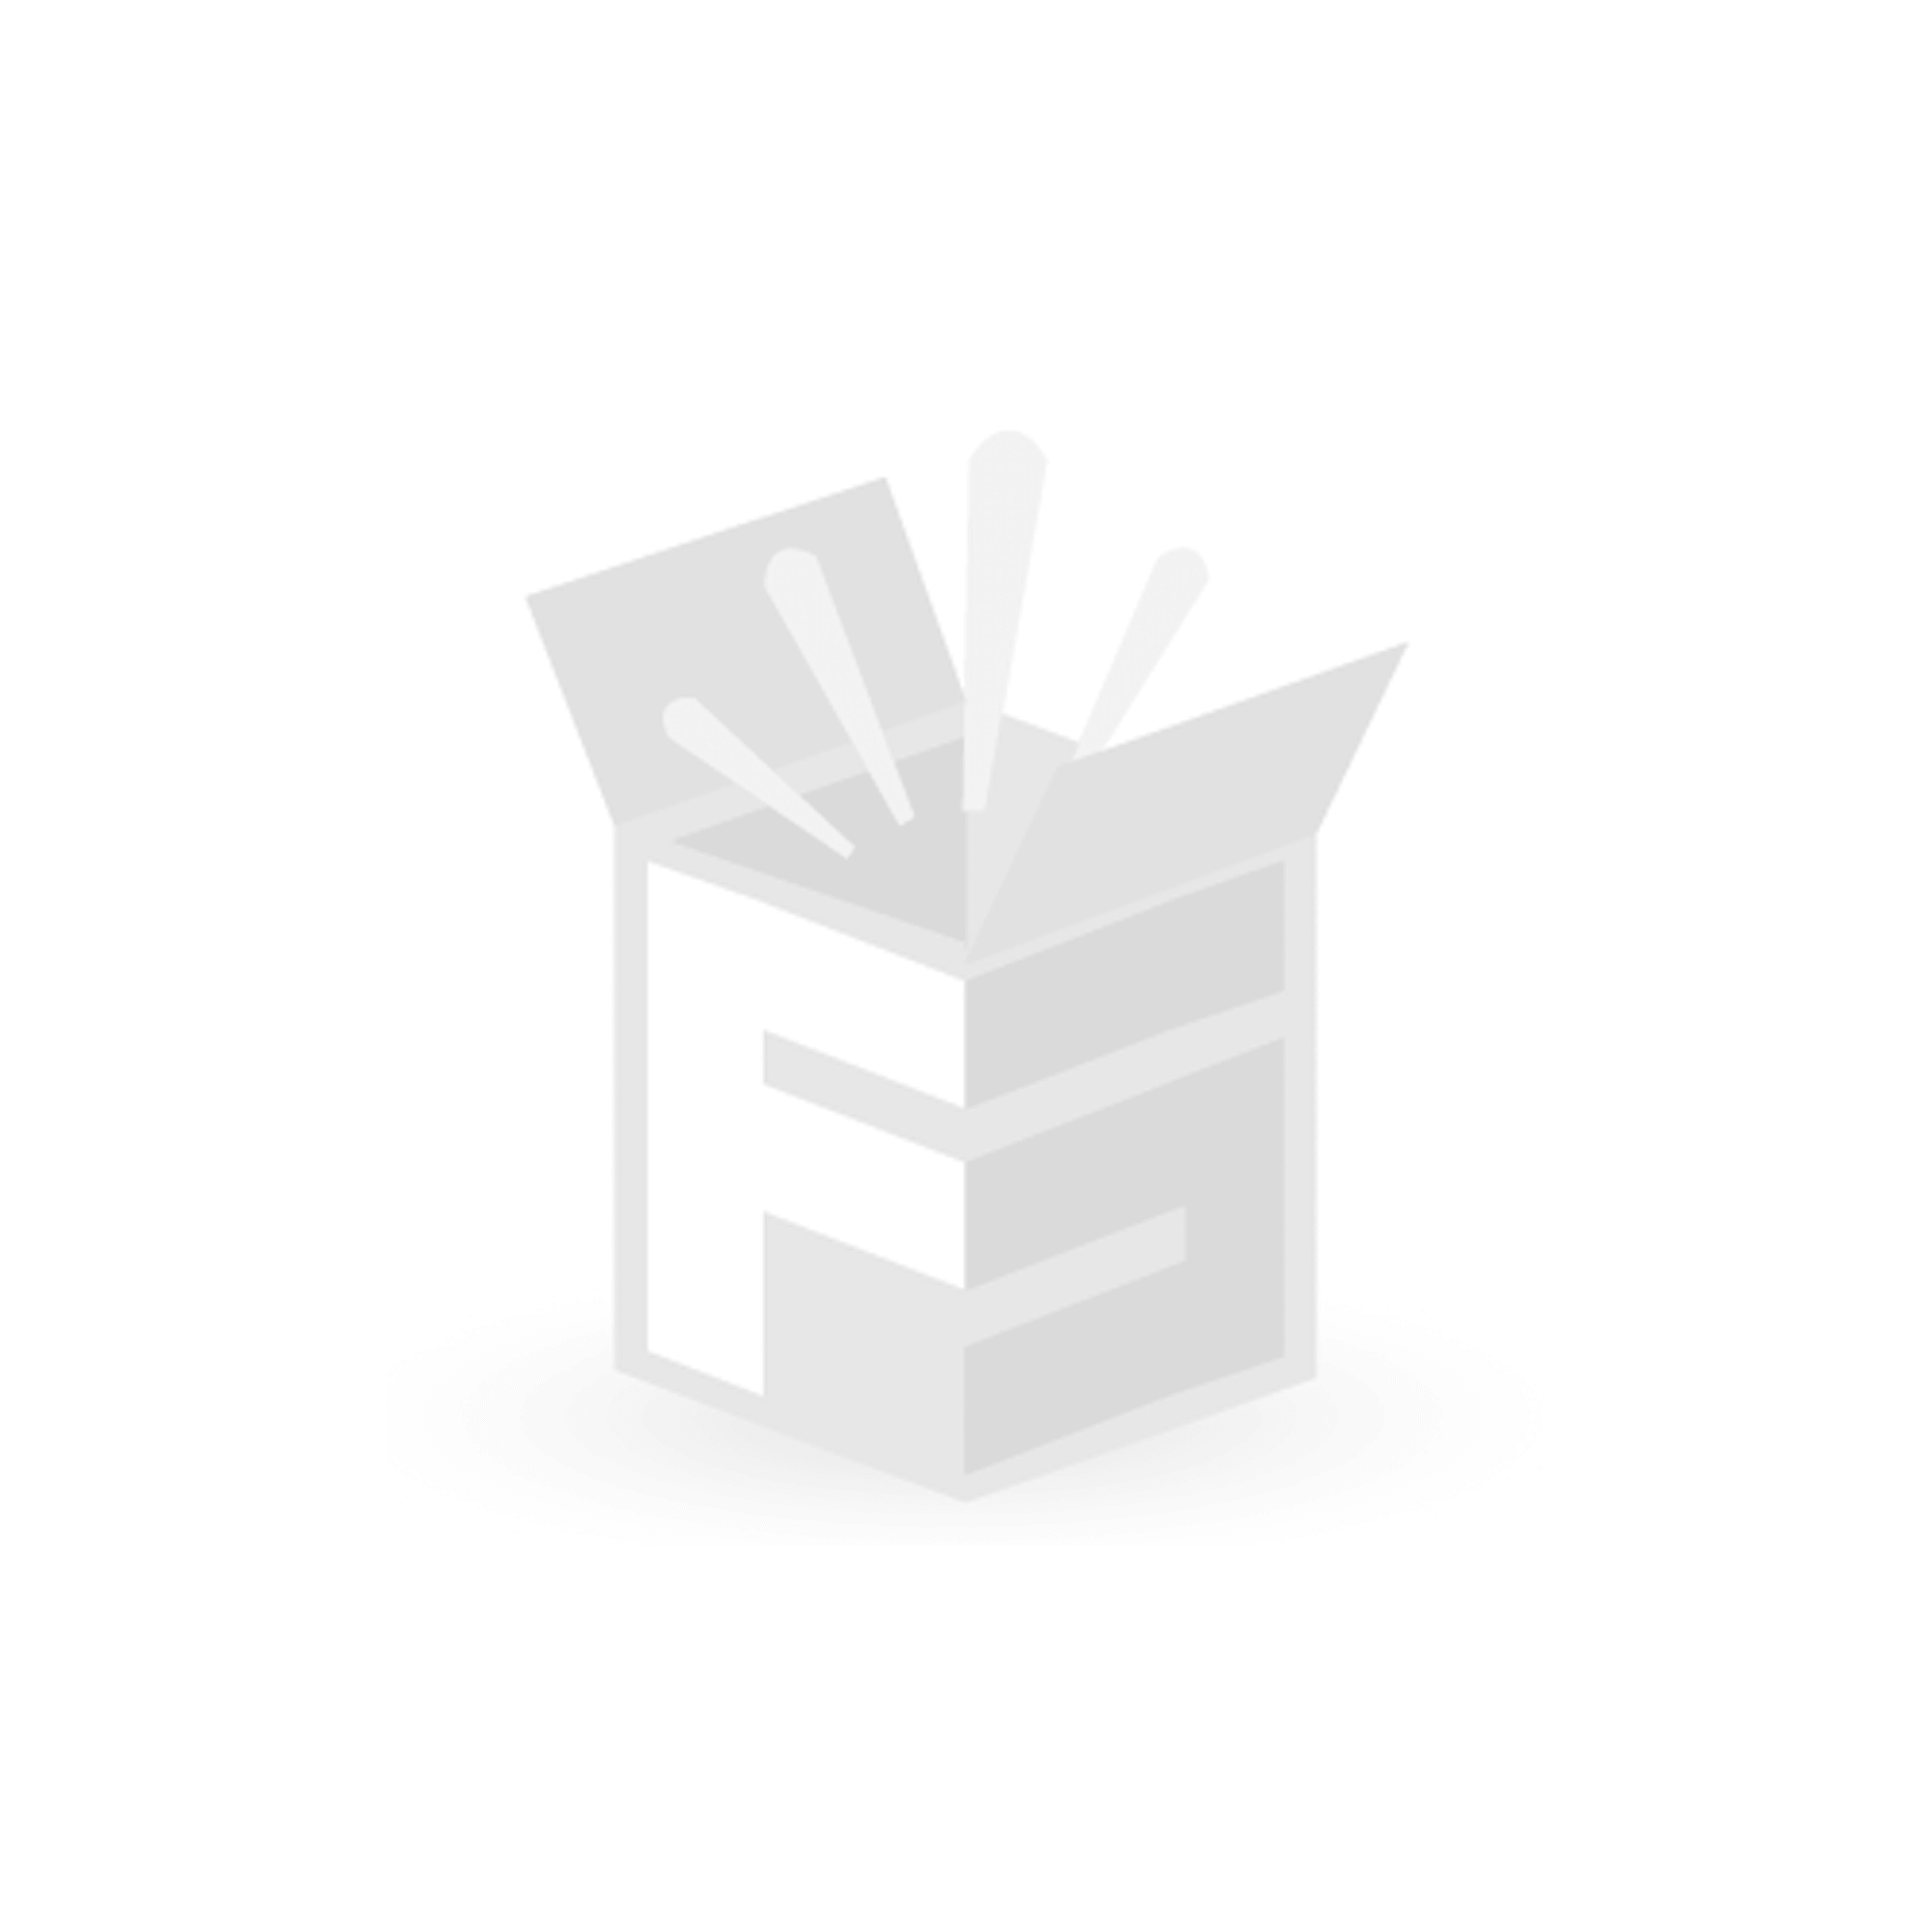 WMF Messer-Set 5-teilig, Grand Gourmet